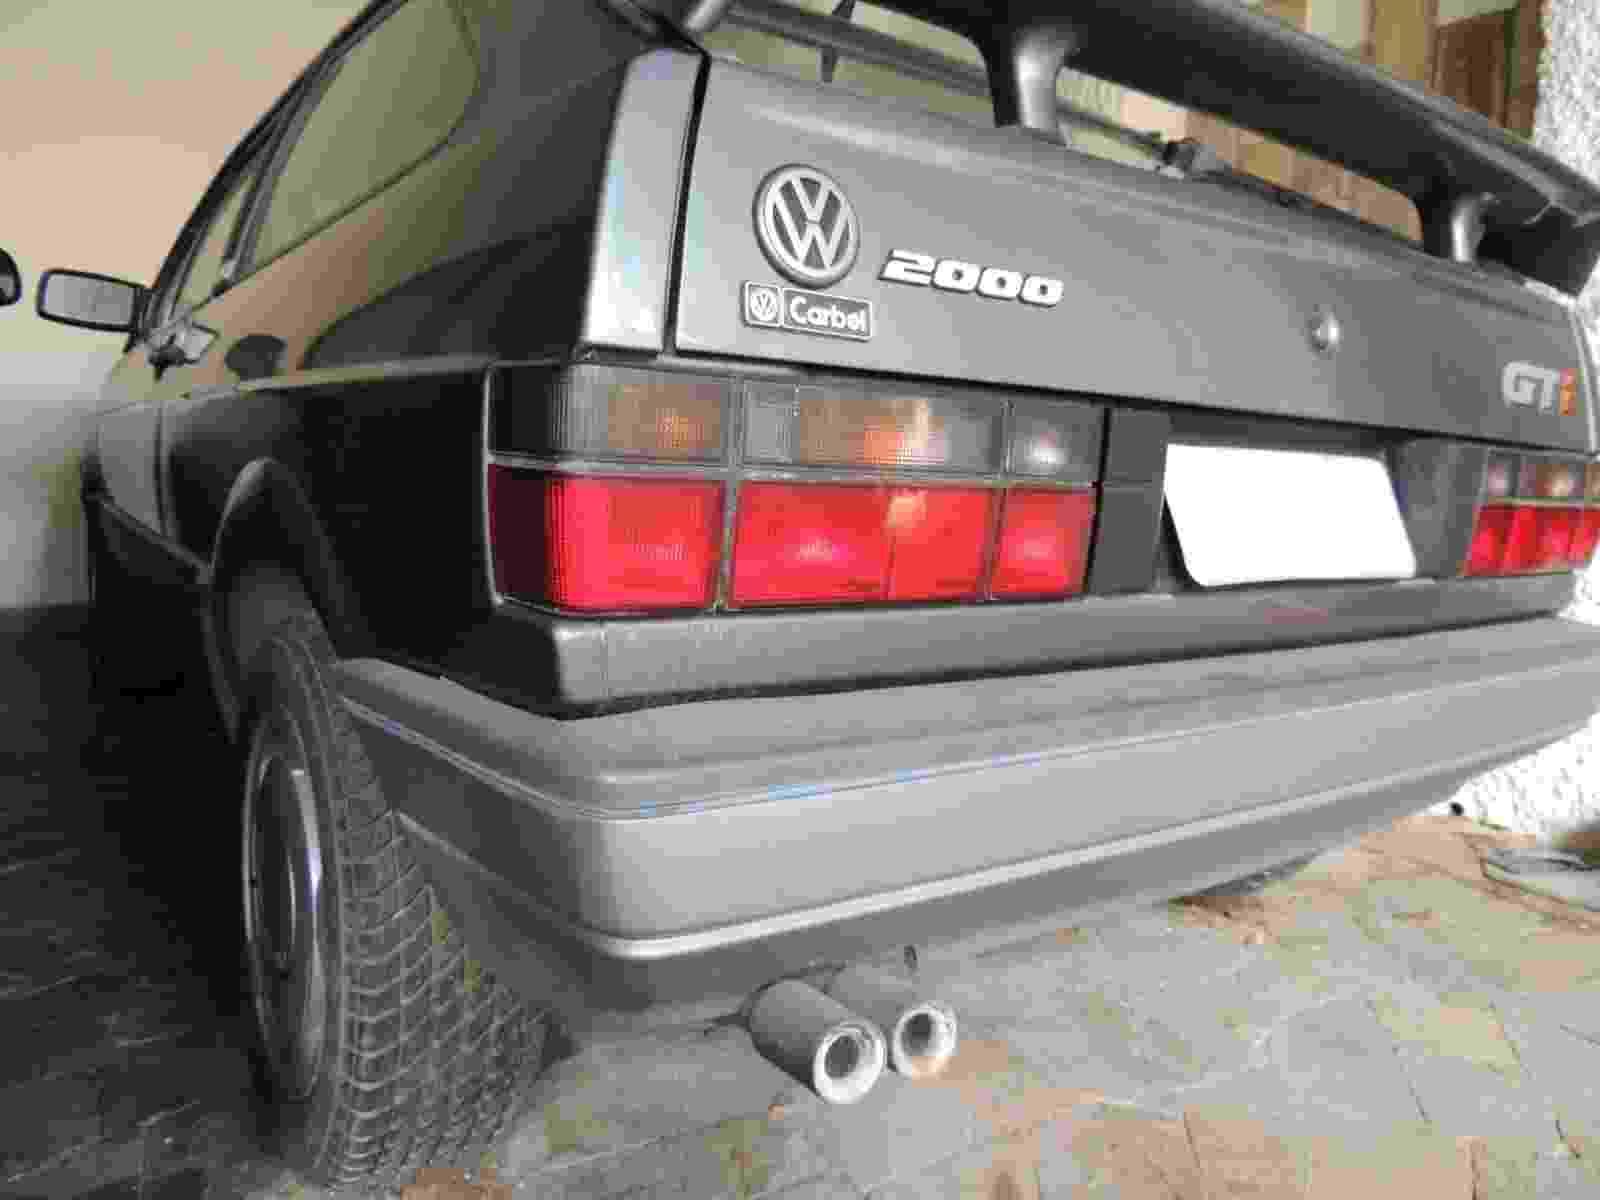 Volkswagen Gol  GTI 1993 sujo Caçadores de Tesouros Reginaldo de Campinas - Arquivo pessoal